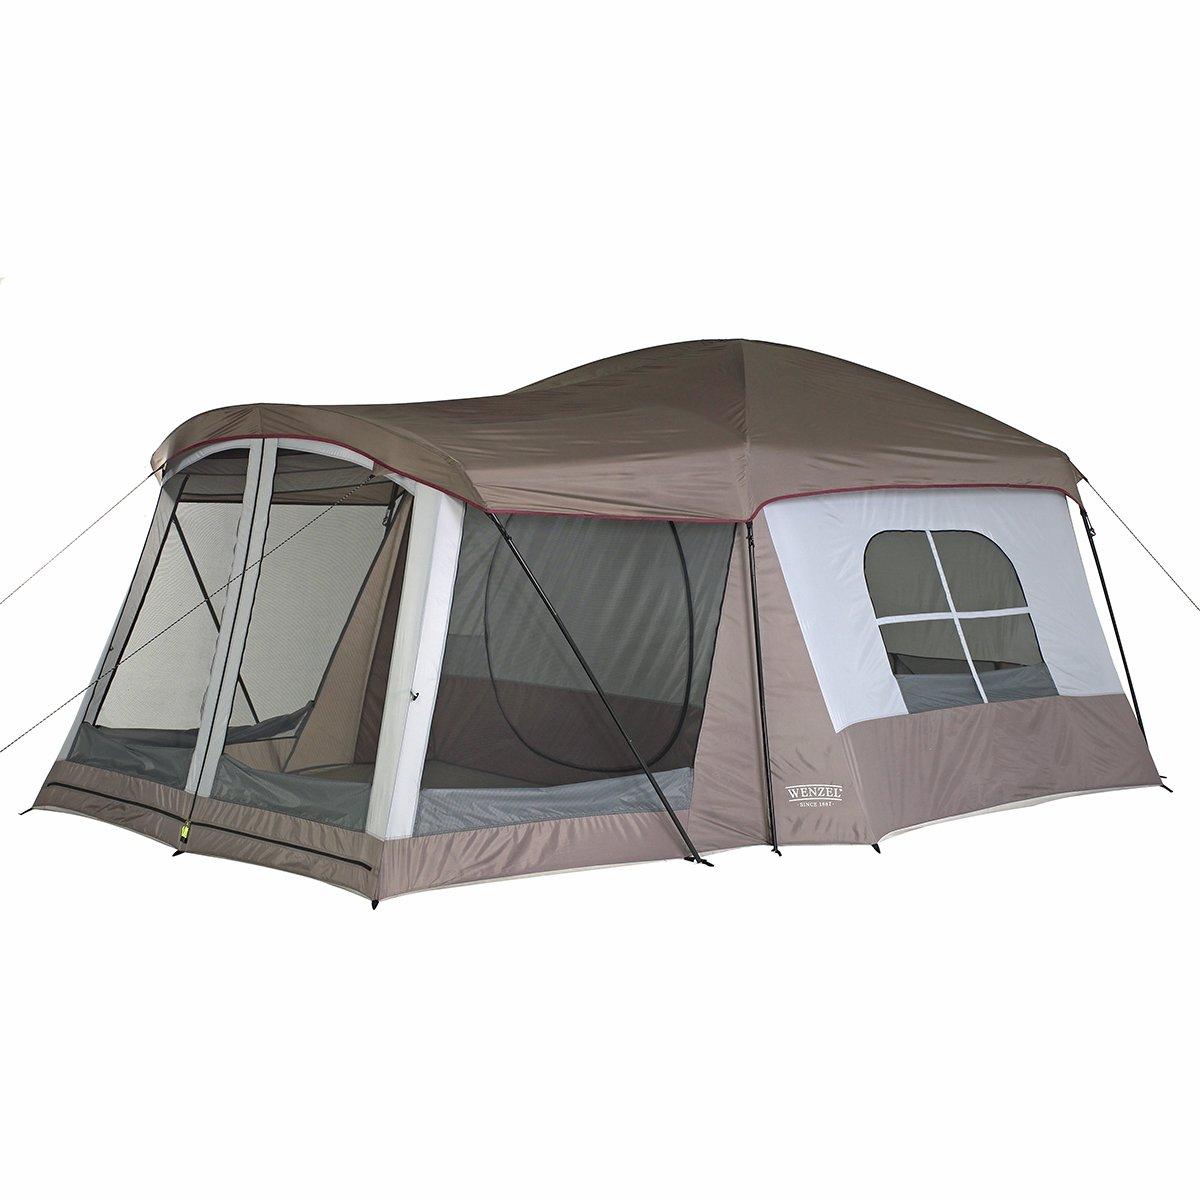 Wenzel Klondike Tent Amp Wenzel Klondike Tent 16x11 Large 8